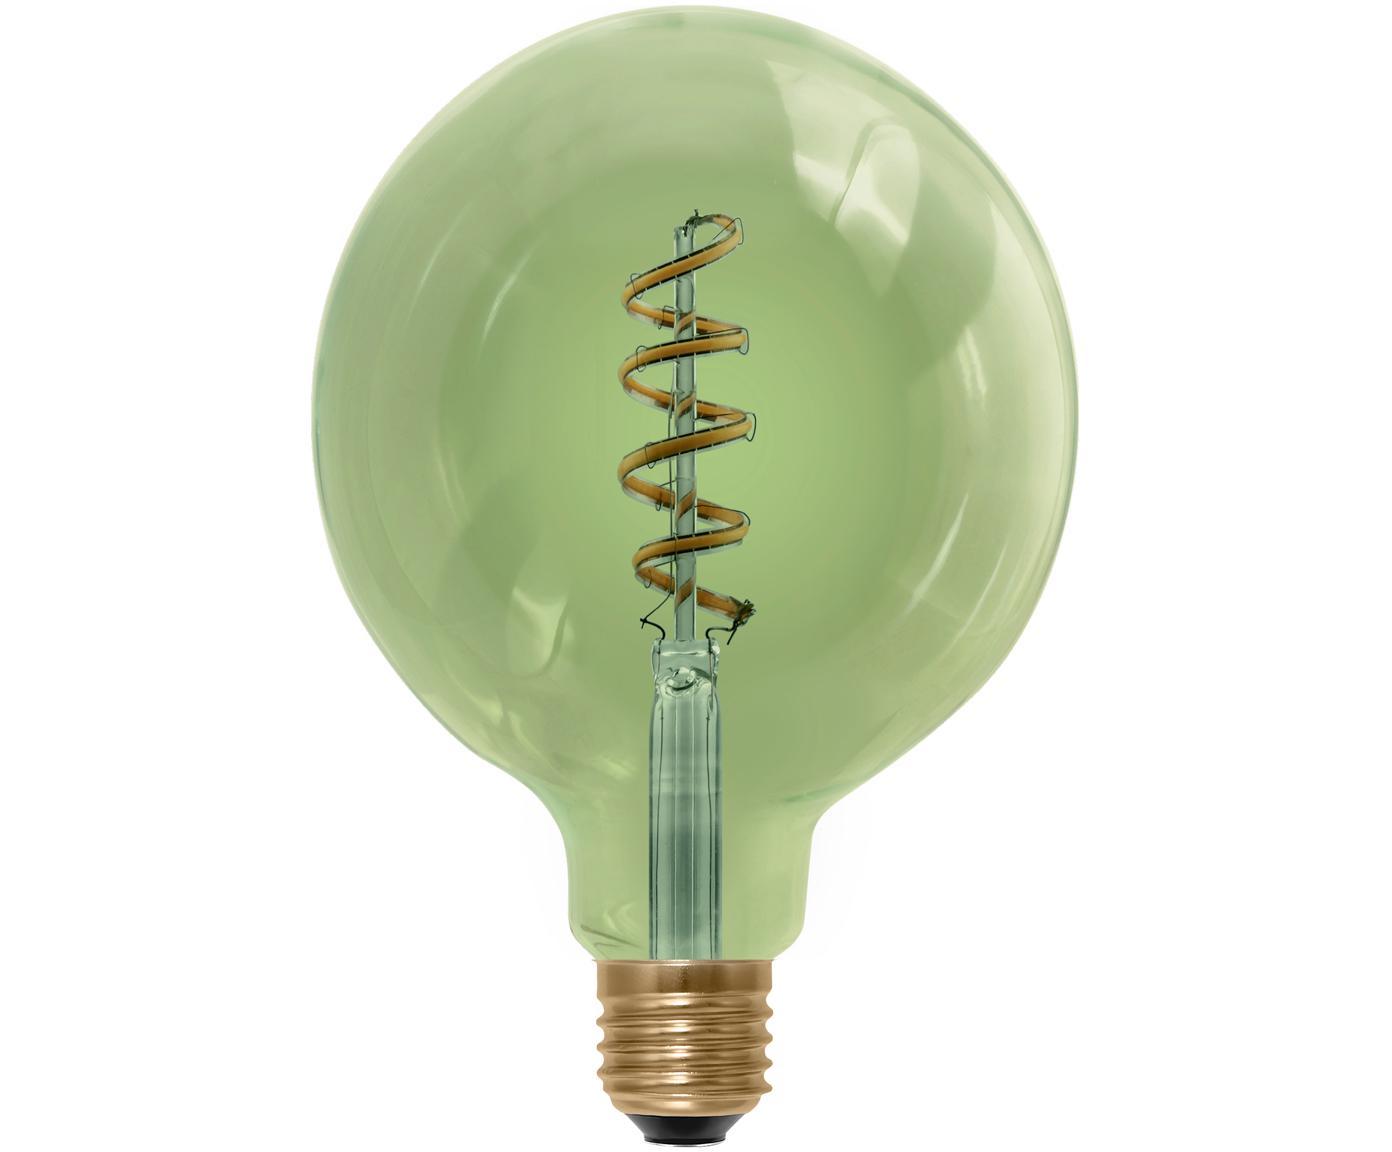 Grosses LED Leuchtmittel Curved (E27/8W), Glas, Aluminium, Grün, Ø 13 x H 18 cm